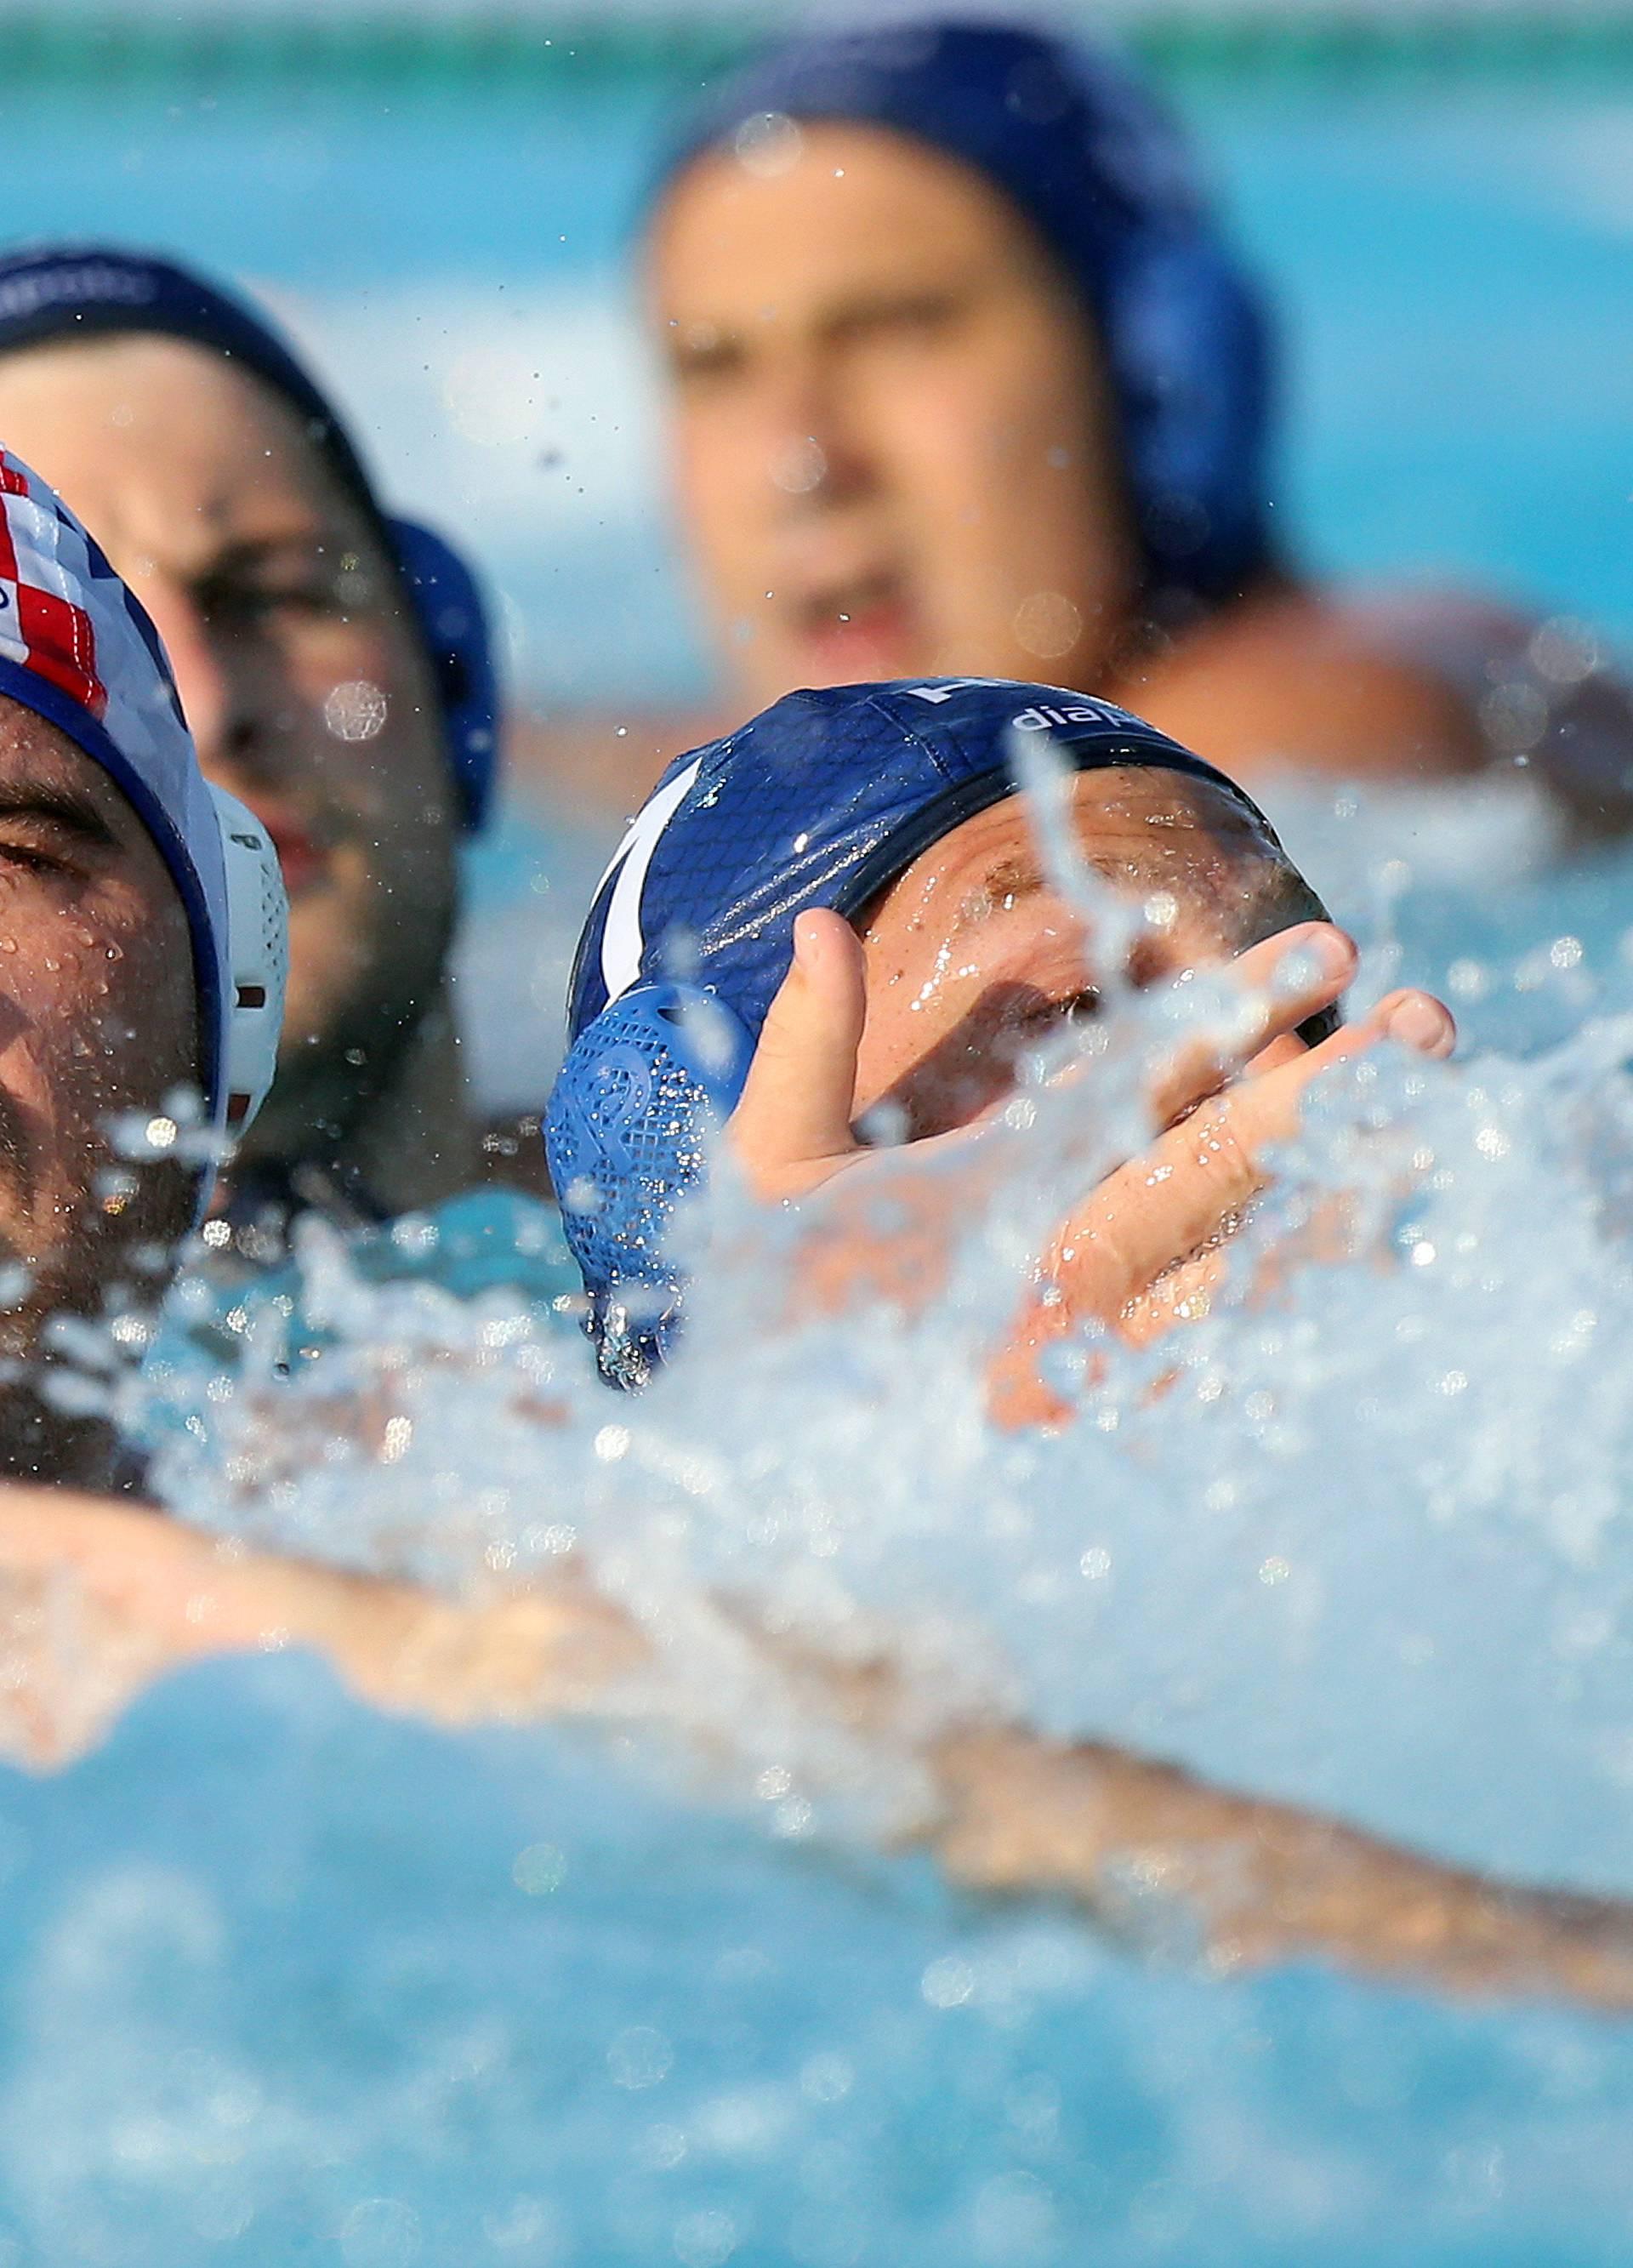 Zagreb: Pripremna prijateljska vaterpolo utakmica Hrvatska - Mađarska uoči odlaska na EP u Španjolsku